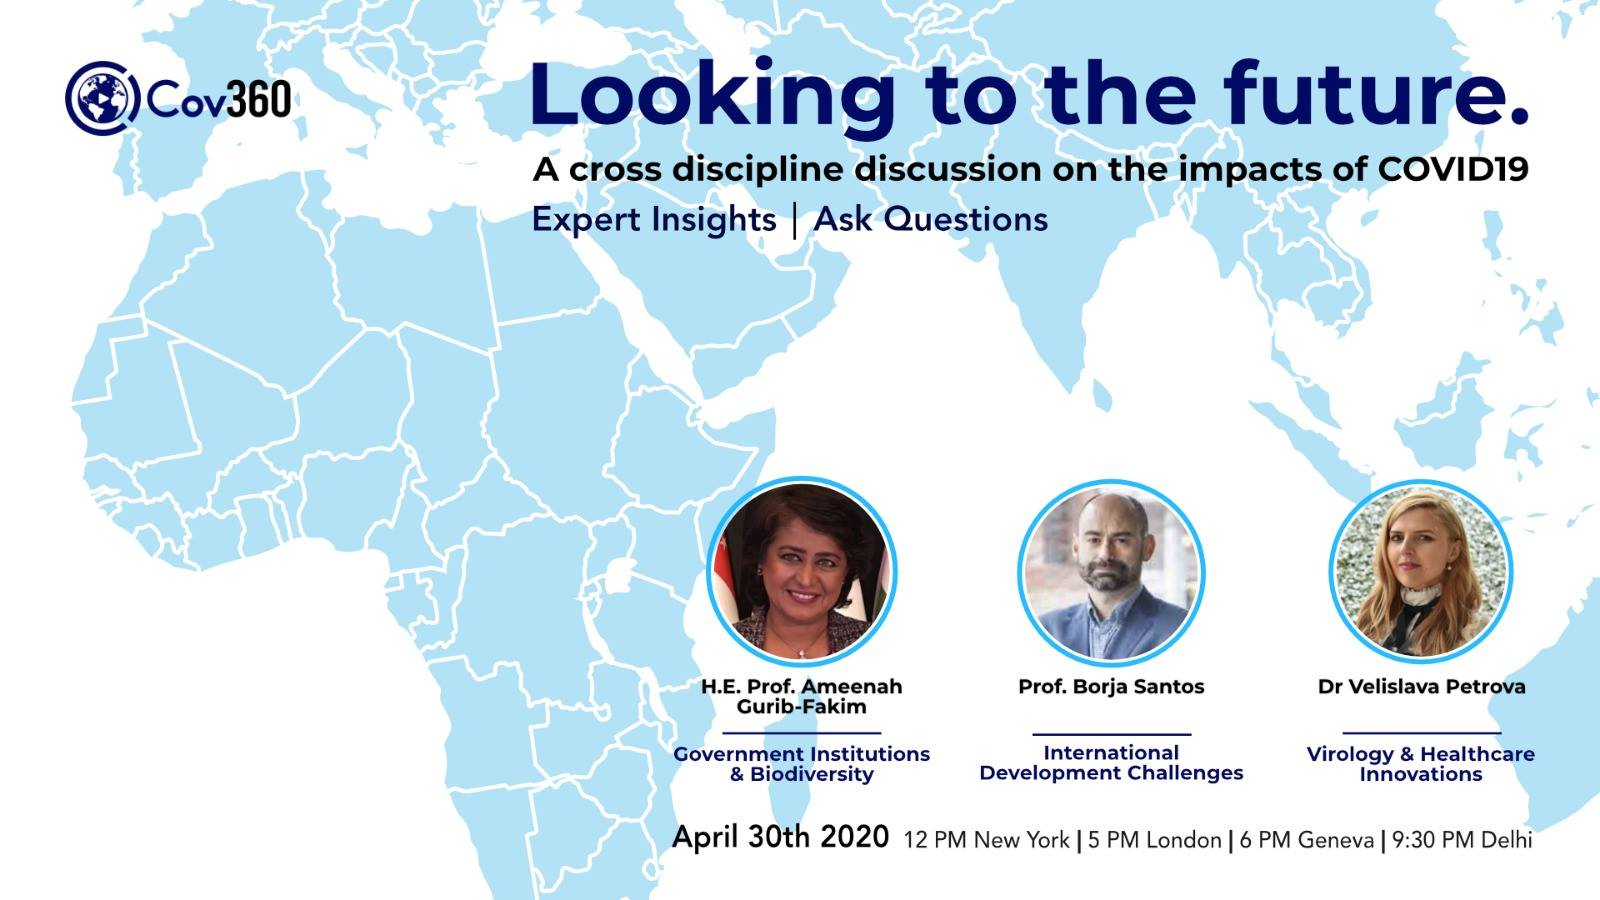 Cov360, Looking to the Future: H.E. Prof Ameenah Gurib-Fakim, Dr Velislava Petrova Prof Borja Santos